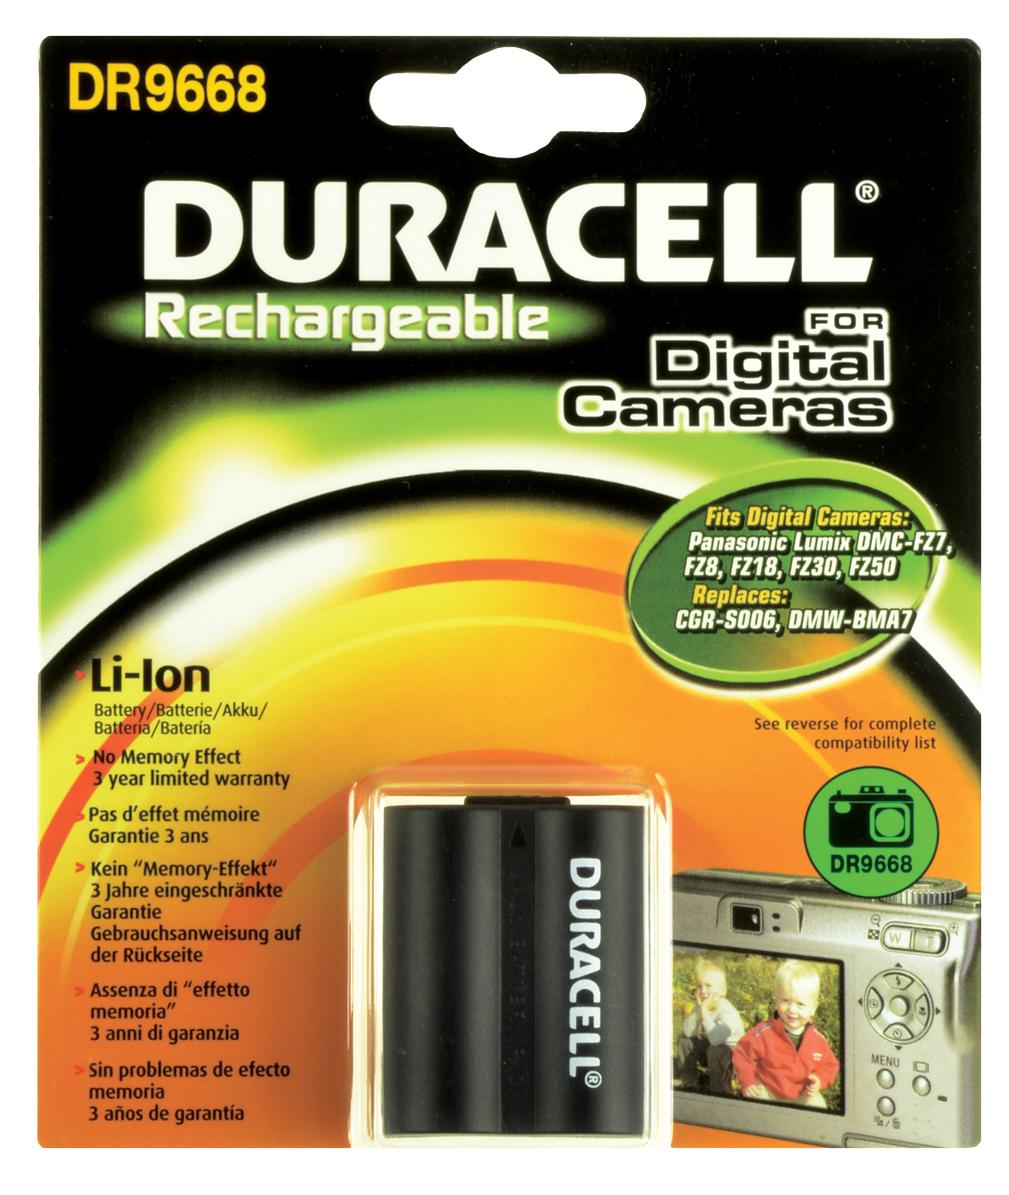 Baterie do fotoaparátu Panasonic DMC-FZ7EF/DMC-FZ7EG/DMC-FZ7GK/DMC-FZ8EG/DMC-FZ8GK/DMC-FZ8K/Lumix DMC-FZ18/Lumix DMC-FZ18EB-K/Lumix DMC-FZ18EG/Lumix…